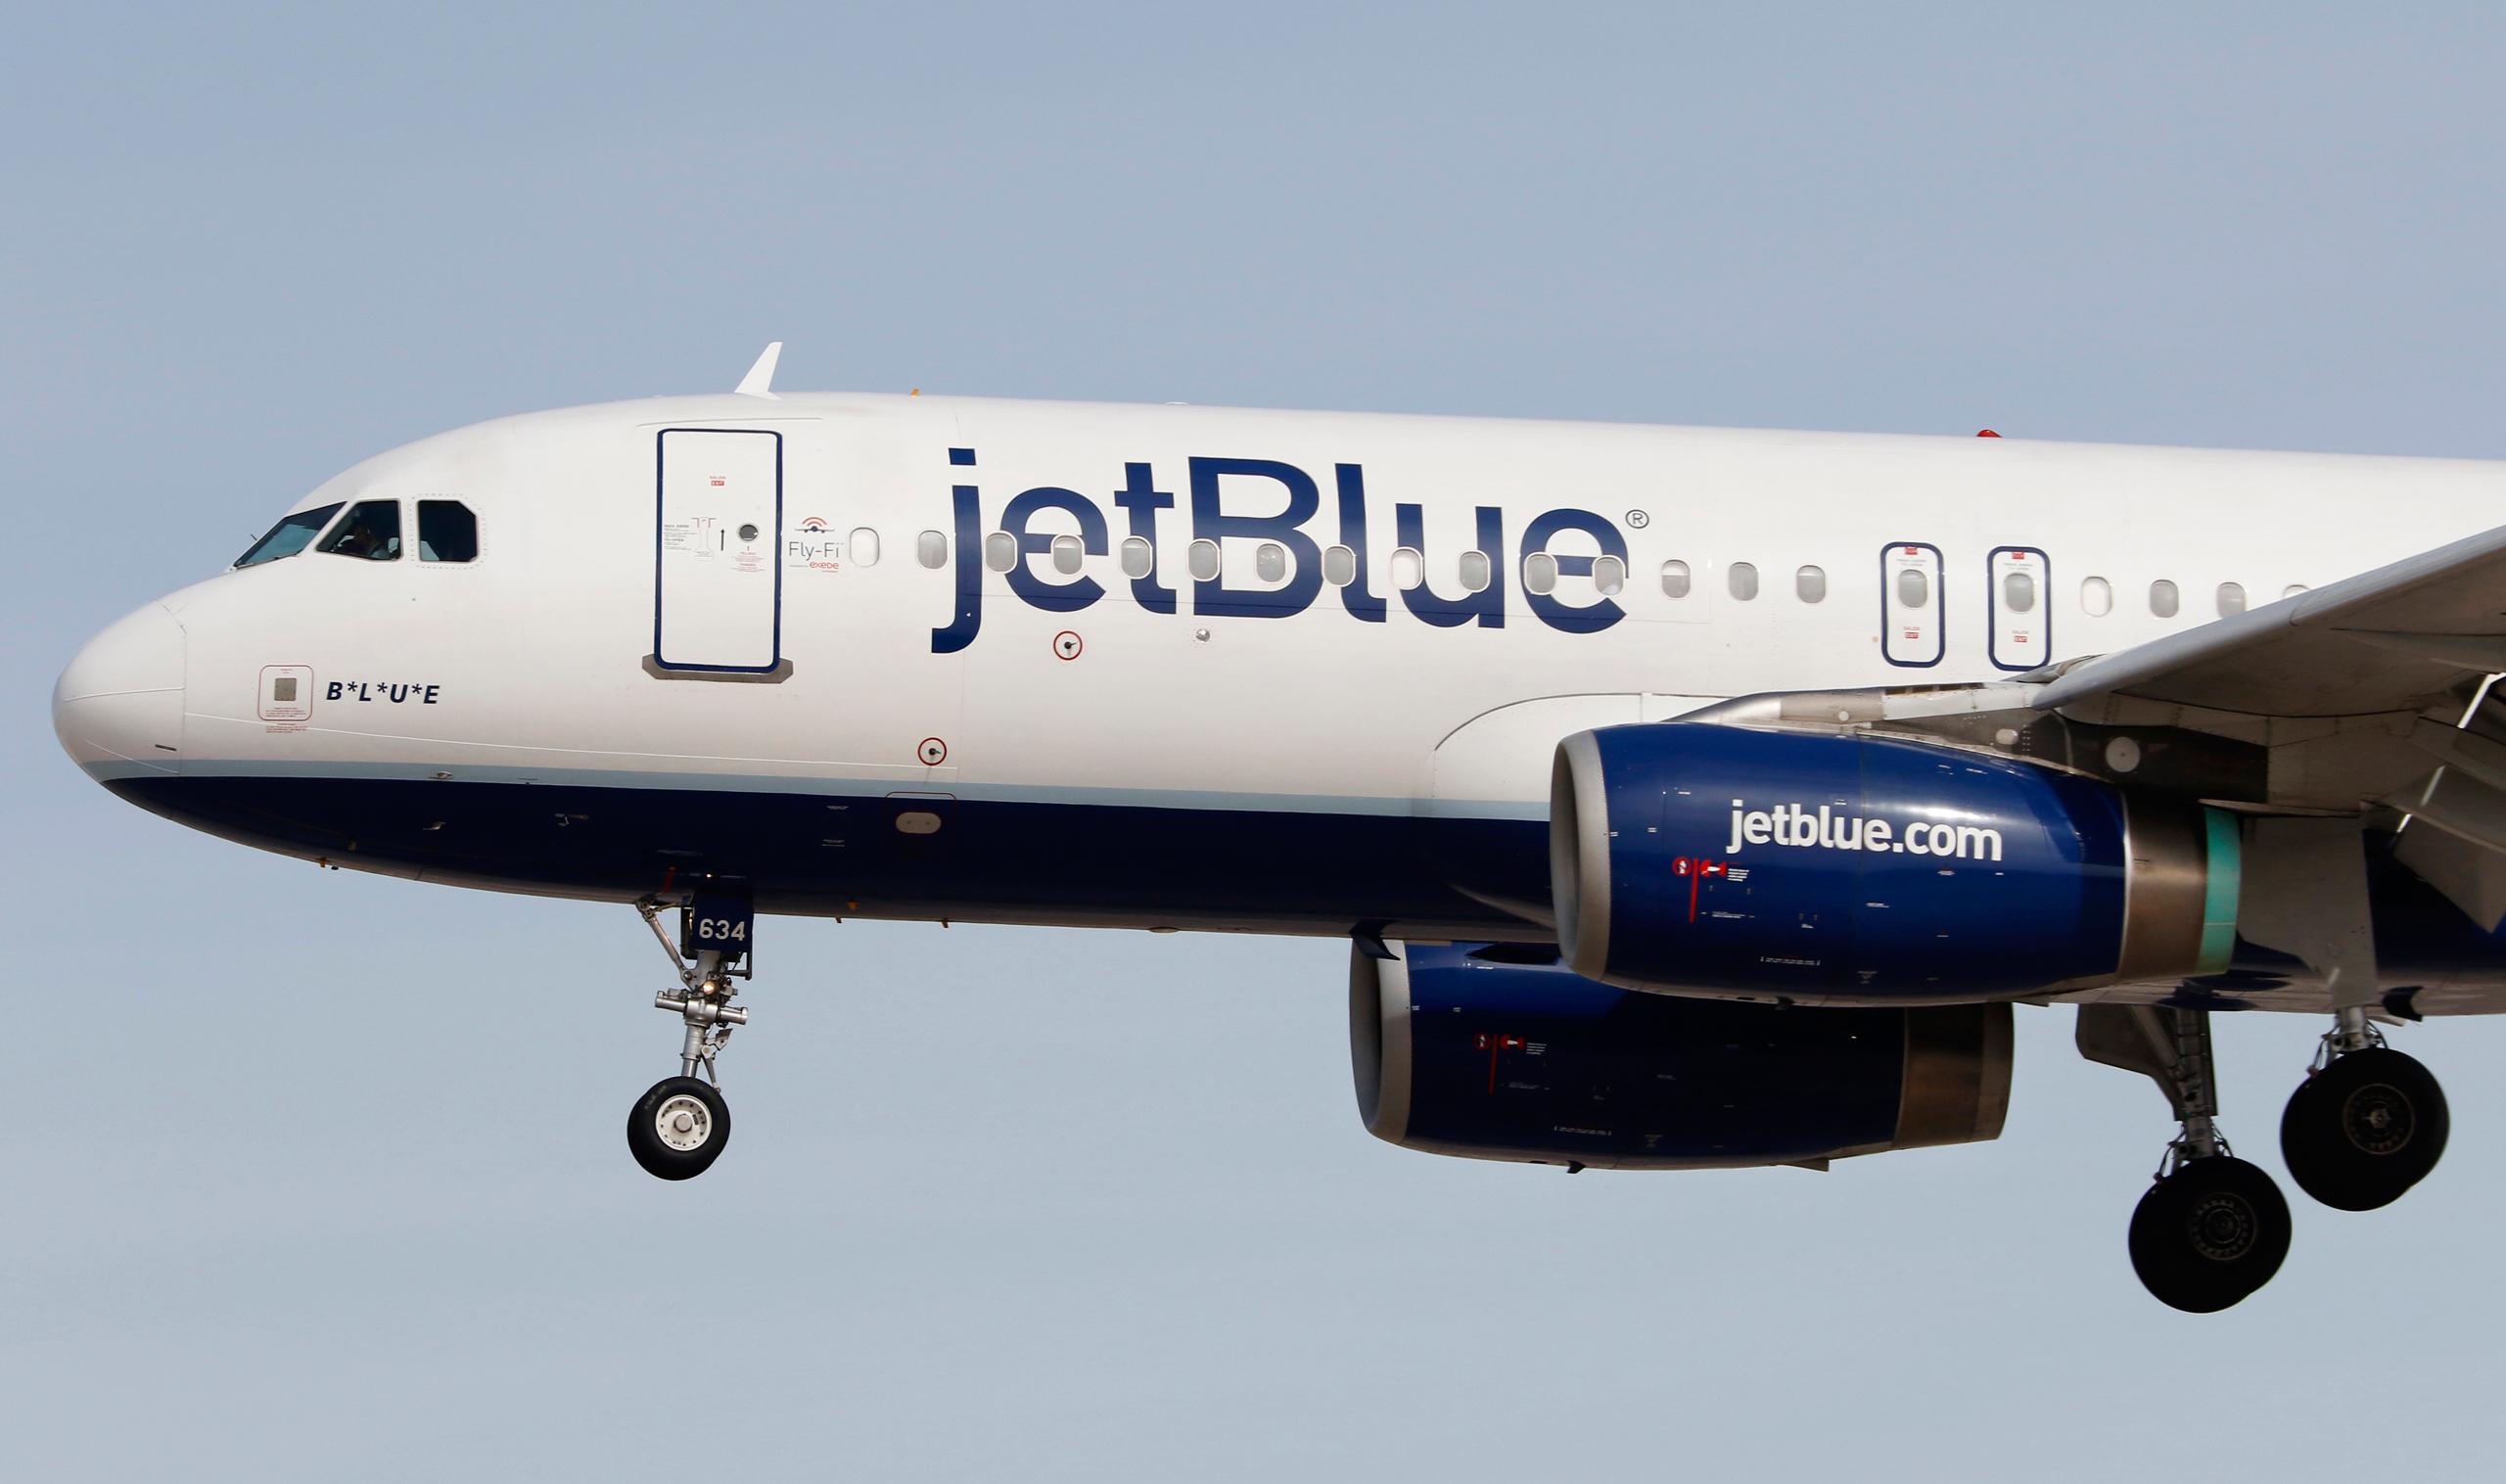 An Airbus A320 jetliner, belonging to JetBlue Airways, lands at McCarran International Airport in Las Vegas on Mar. 2, 2016.